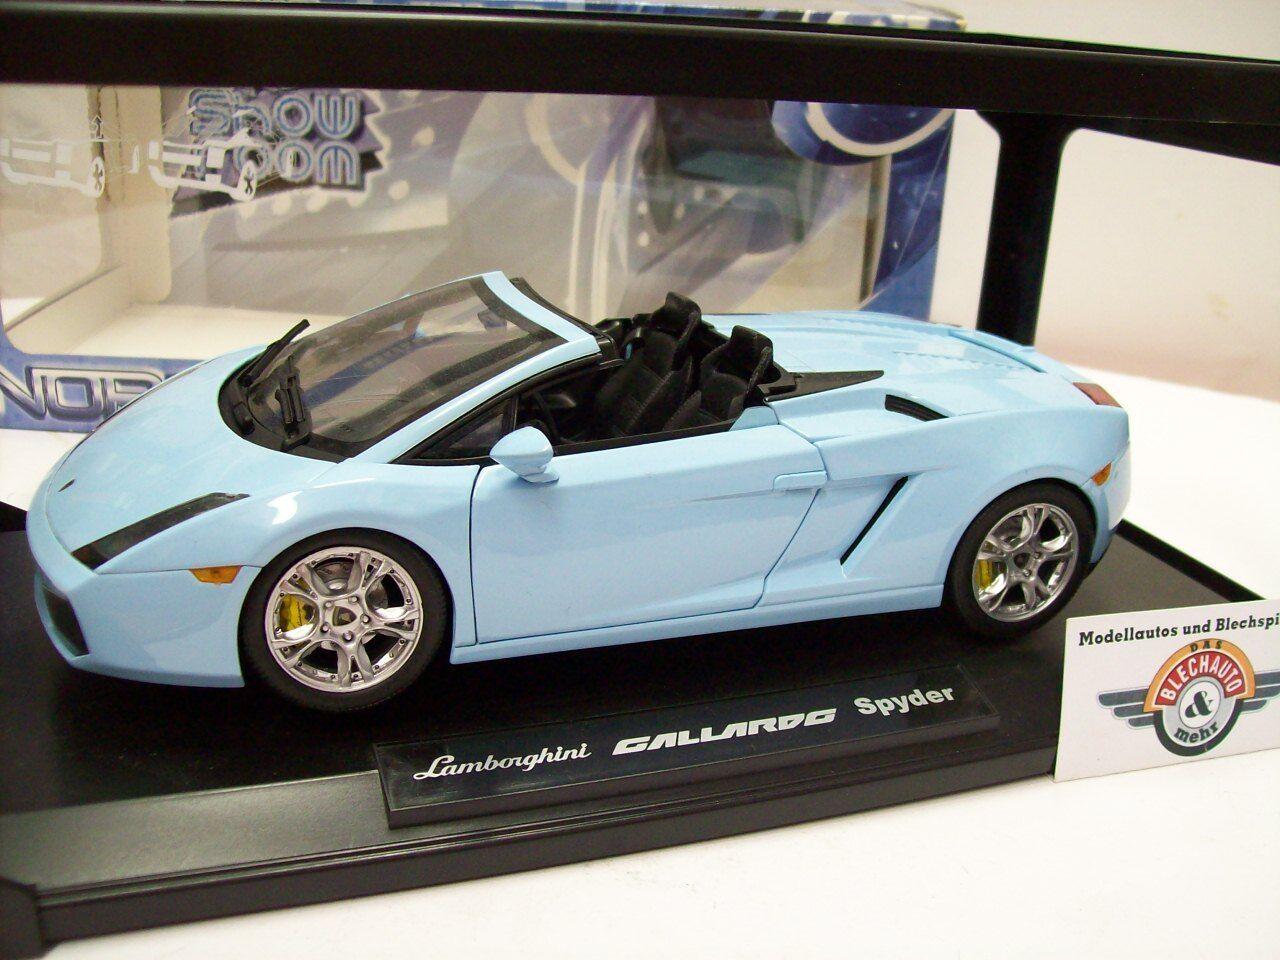 Lamborghini Gallardo Spyder, lumière bleu, 2006, NOREV 1 18,  NEUF dans sa boîte  grande vente